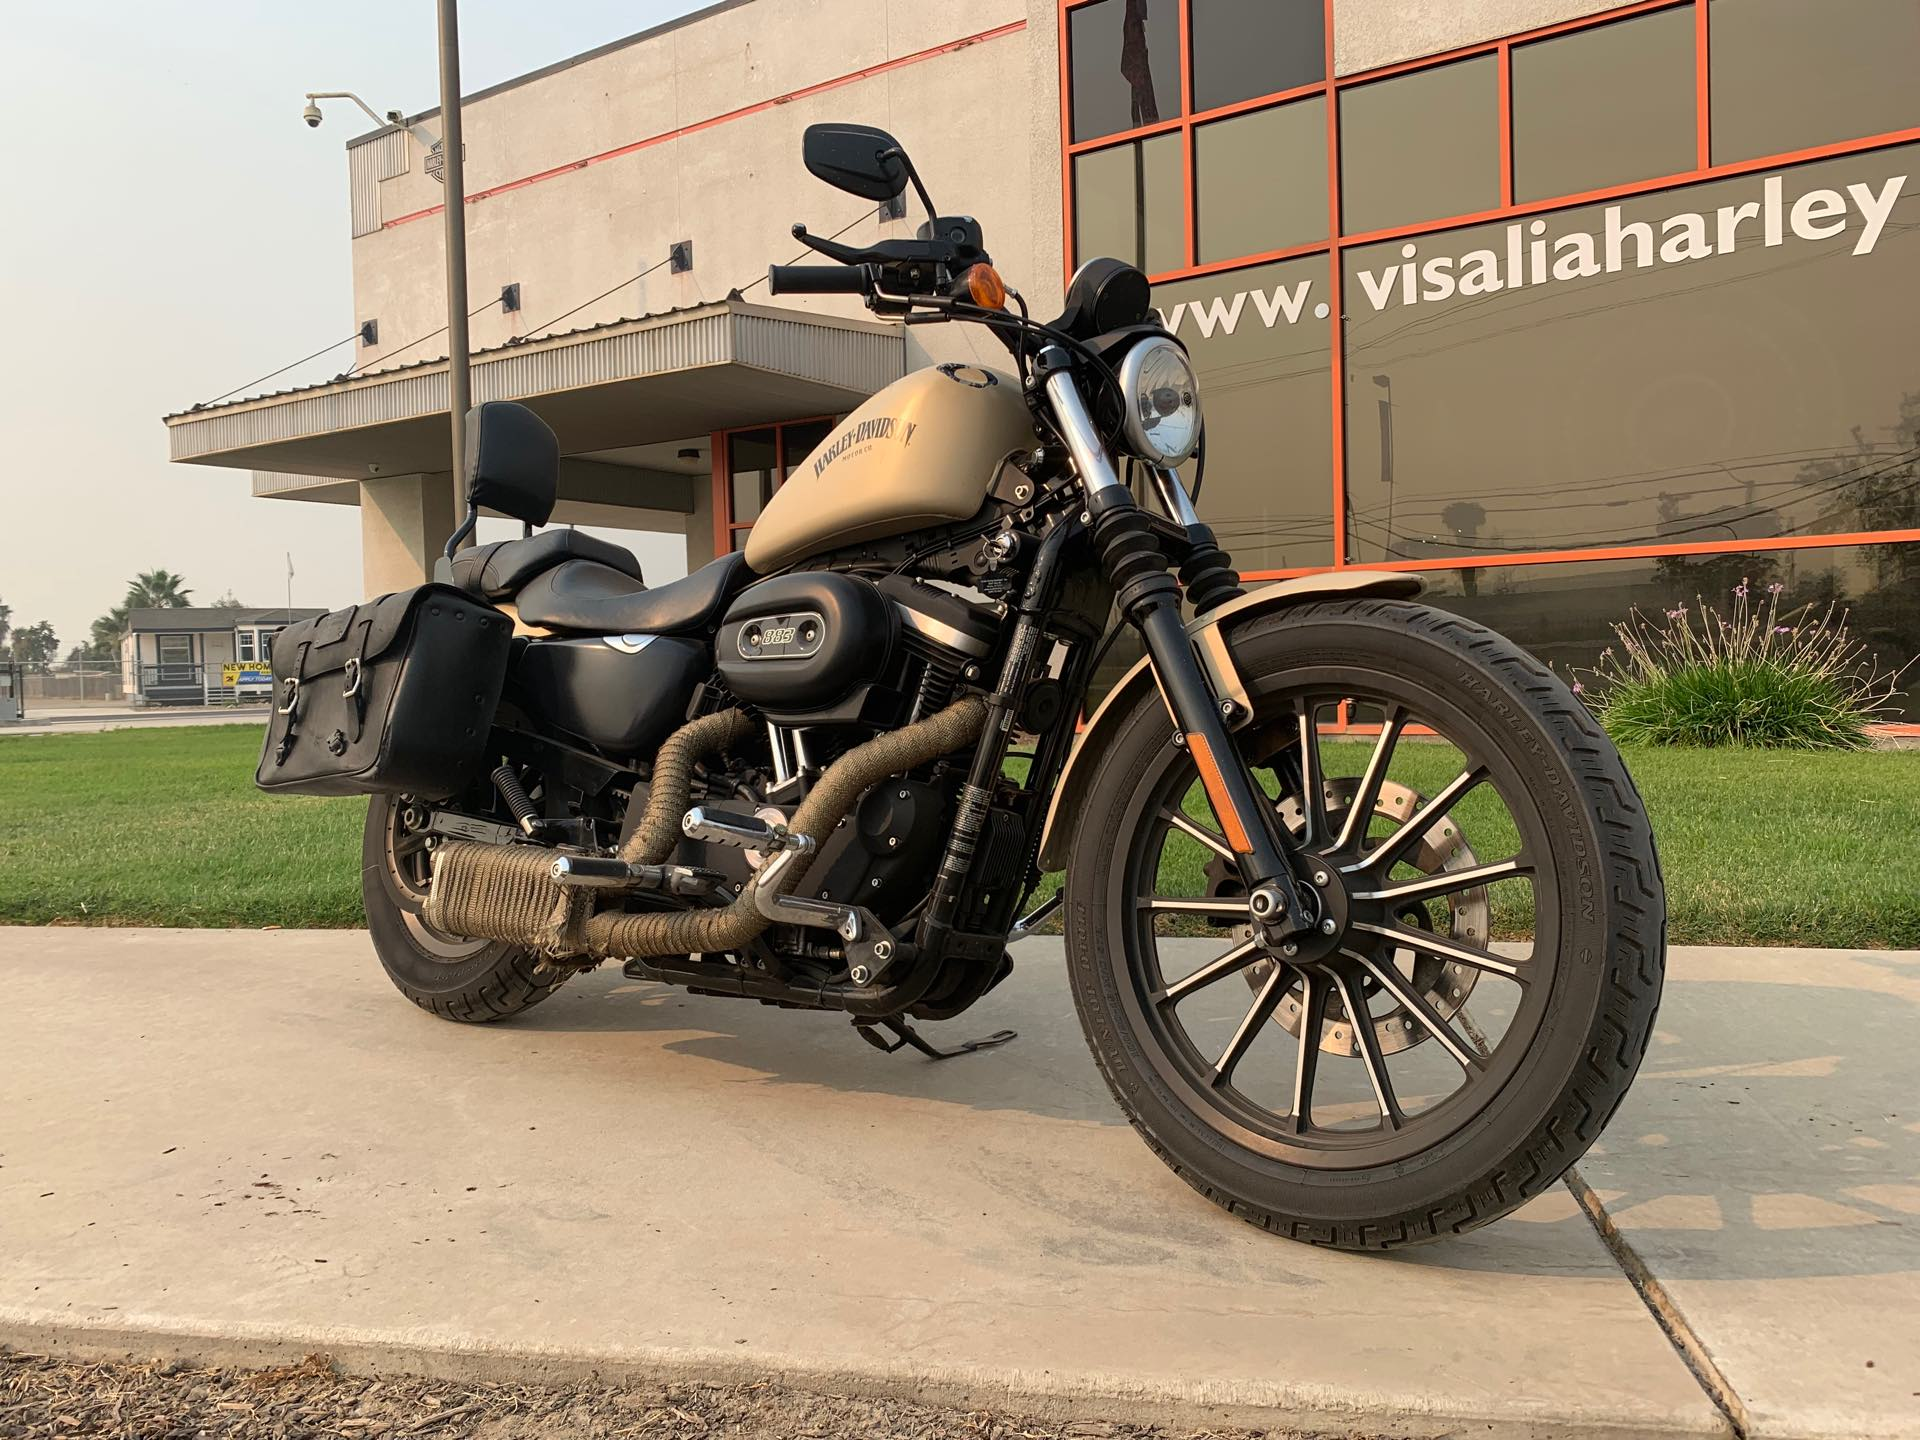 2015 Harley-Davidson Sportster Iron 883 at Visalia Harley-Davidson